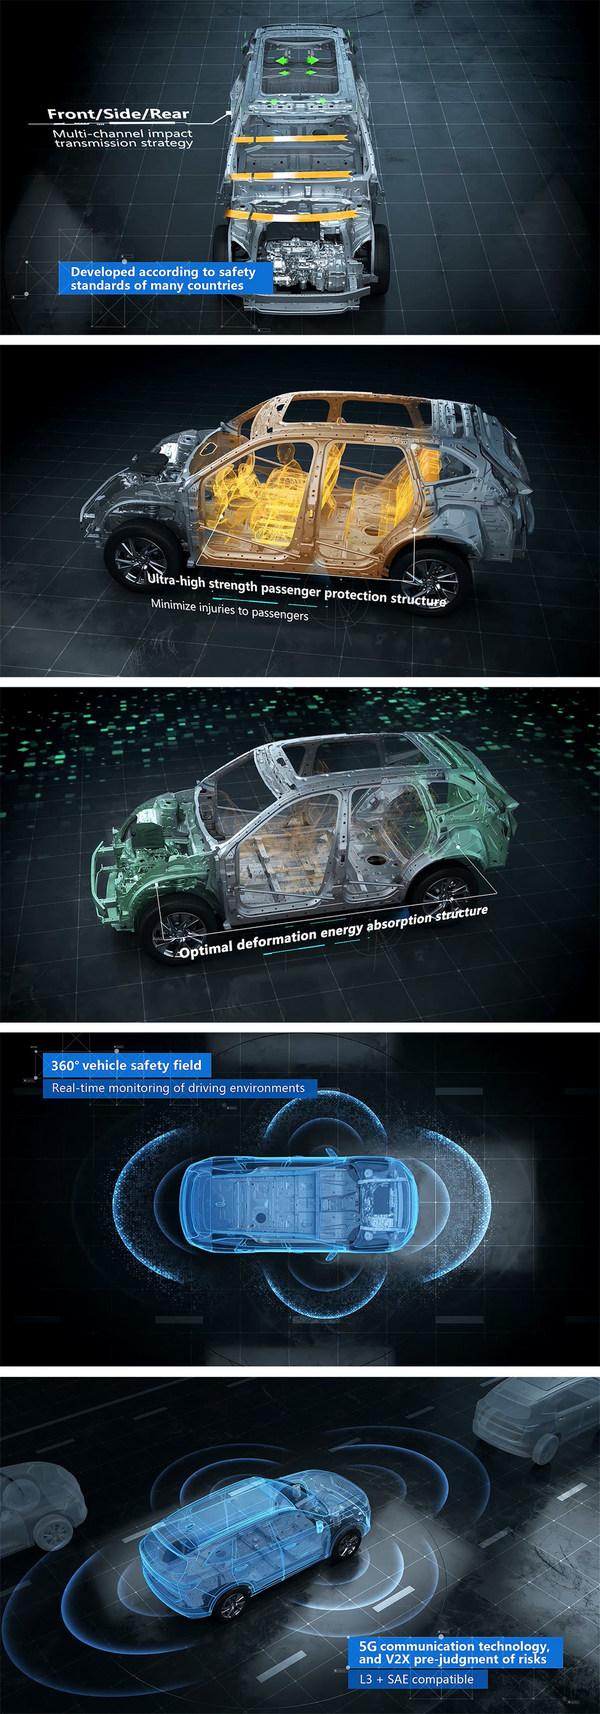 GWMのL.E.M.O.N.プラットフォームは世界の安全運転の新しいトレンドを主導